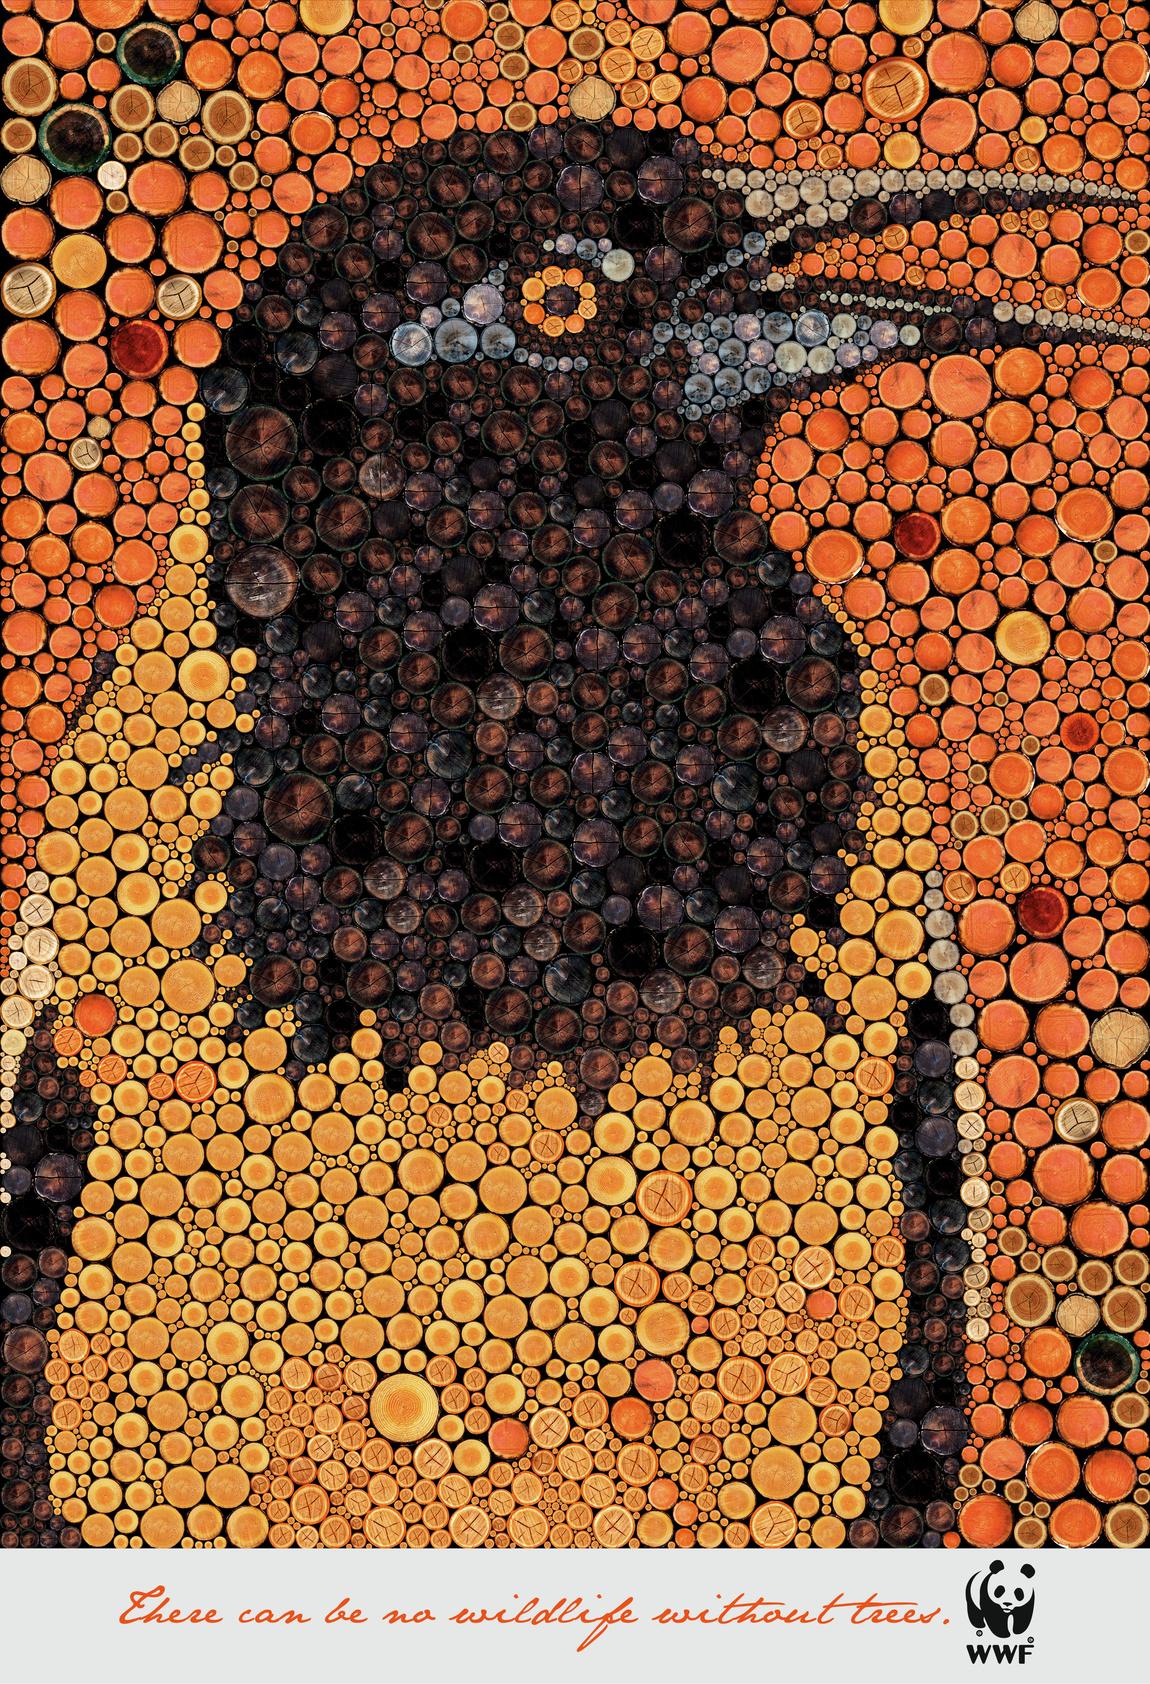 wwf-wwf-zebra-giraffe-bird-tiger-print-384959-adeevee